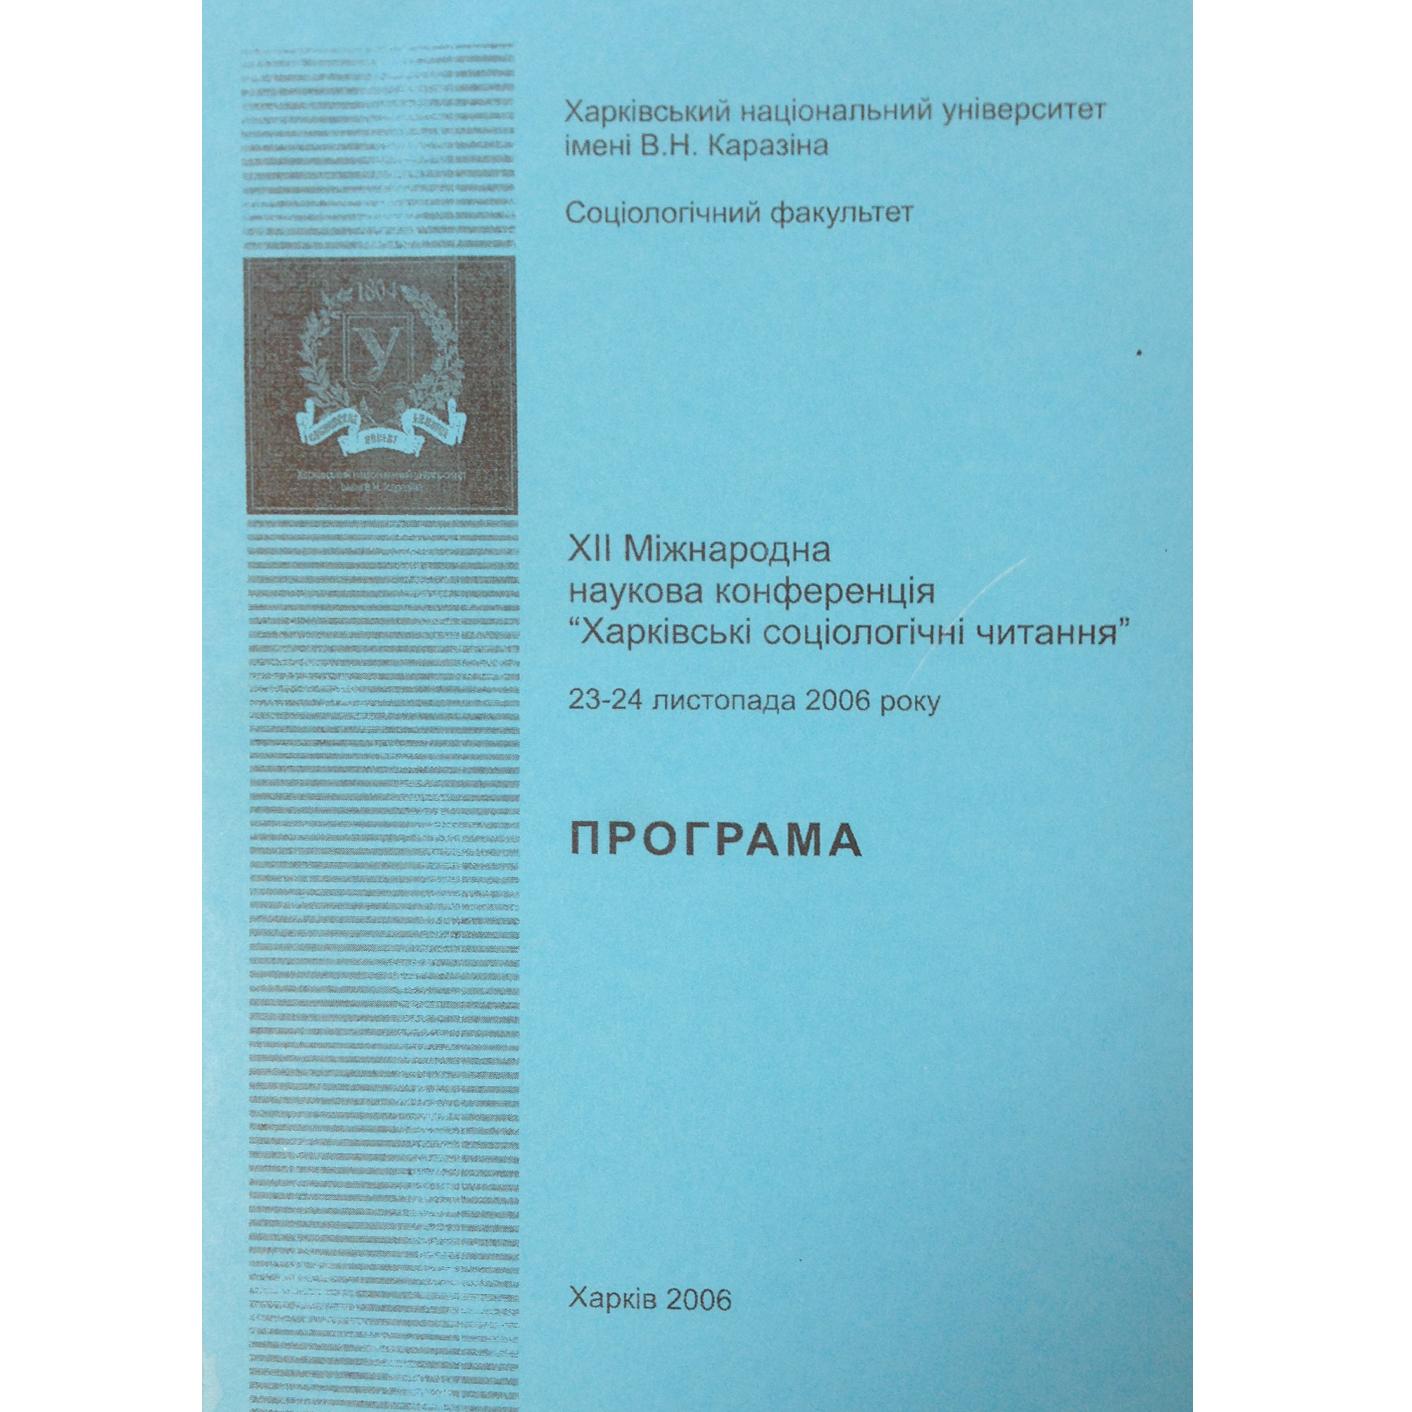 23-24 листопада 2006 року, м. Харків, Україна.